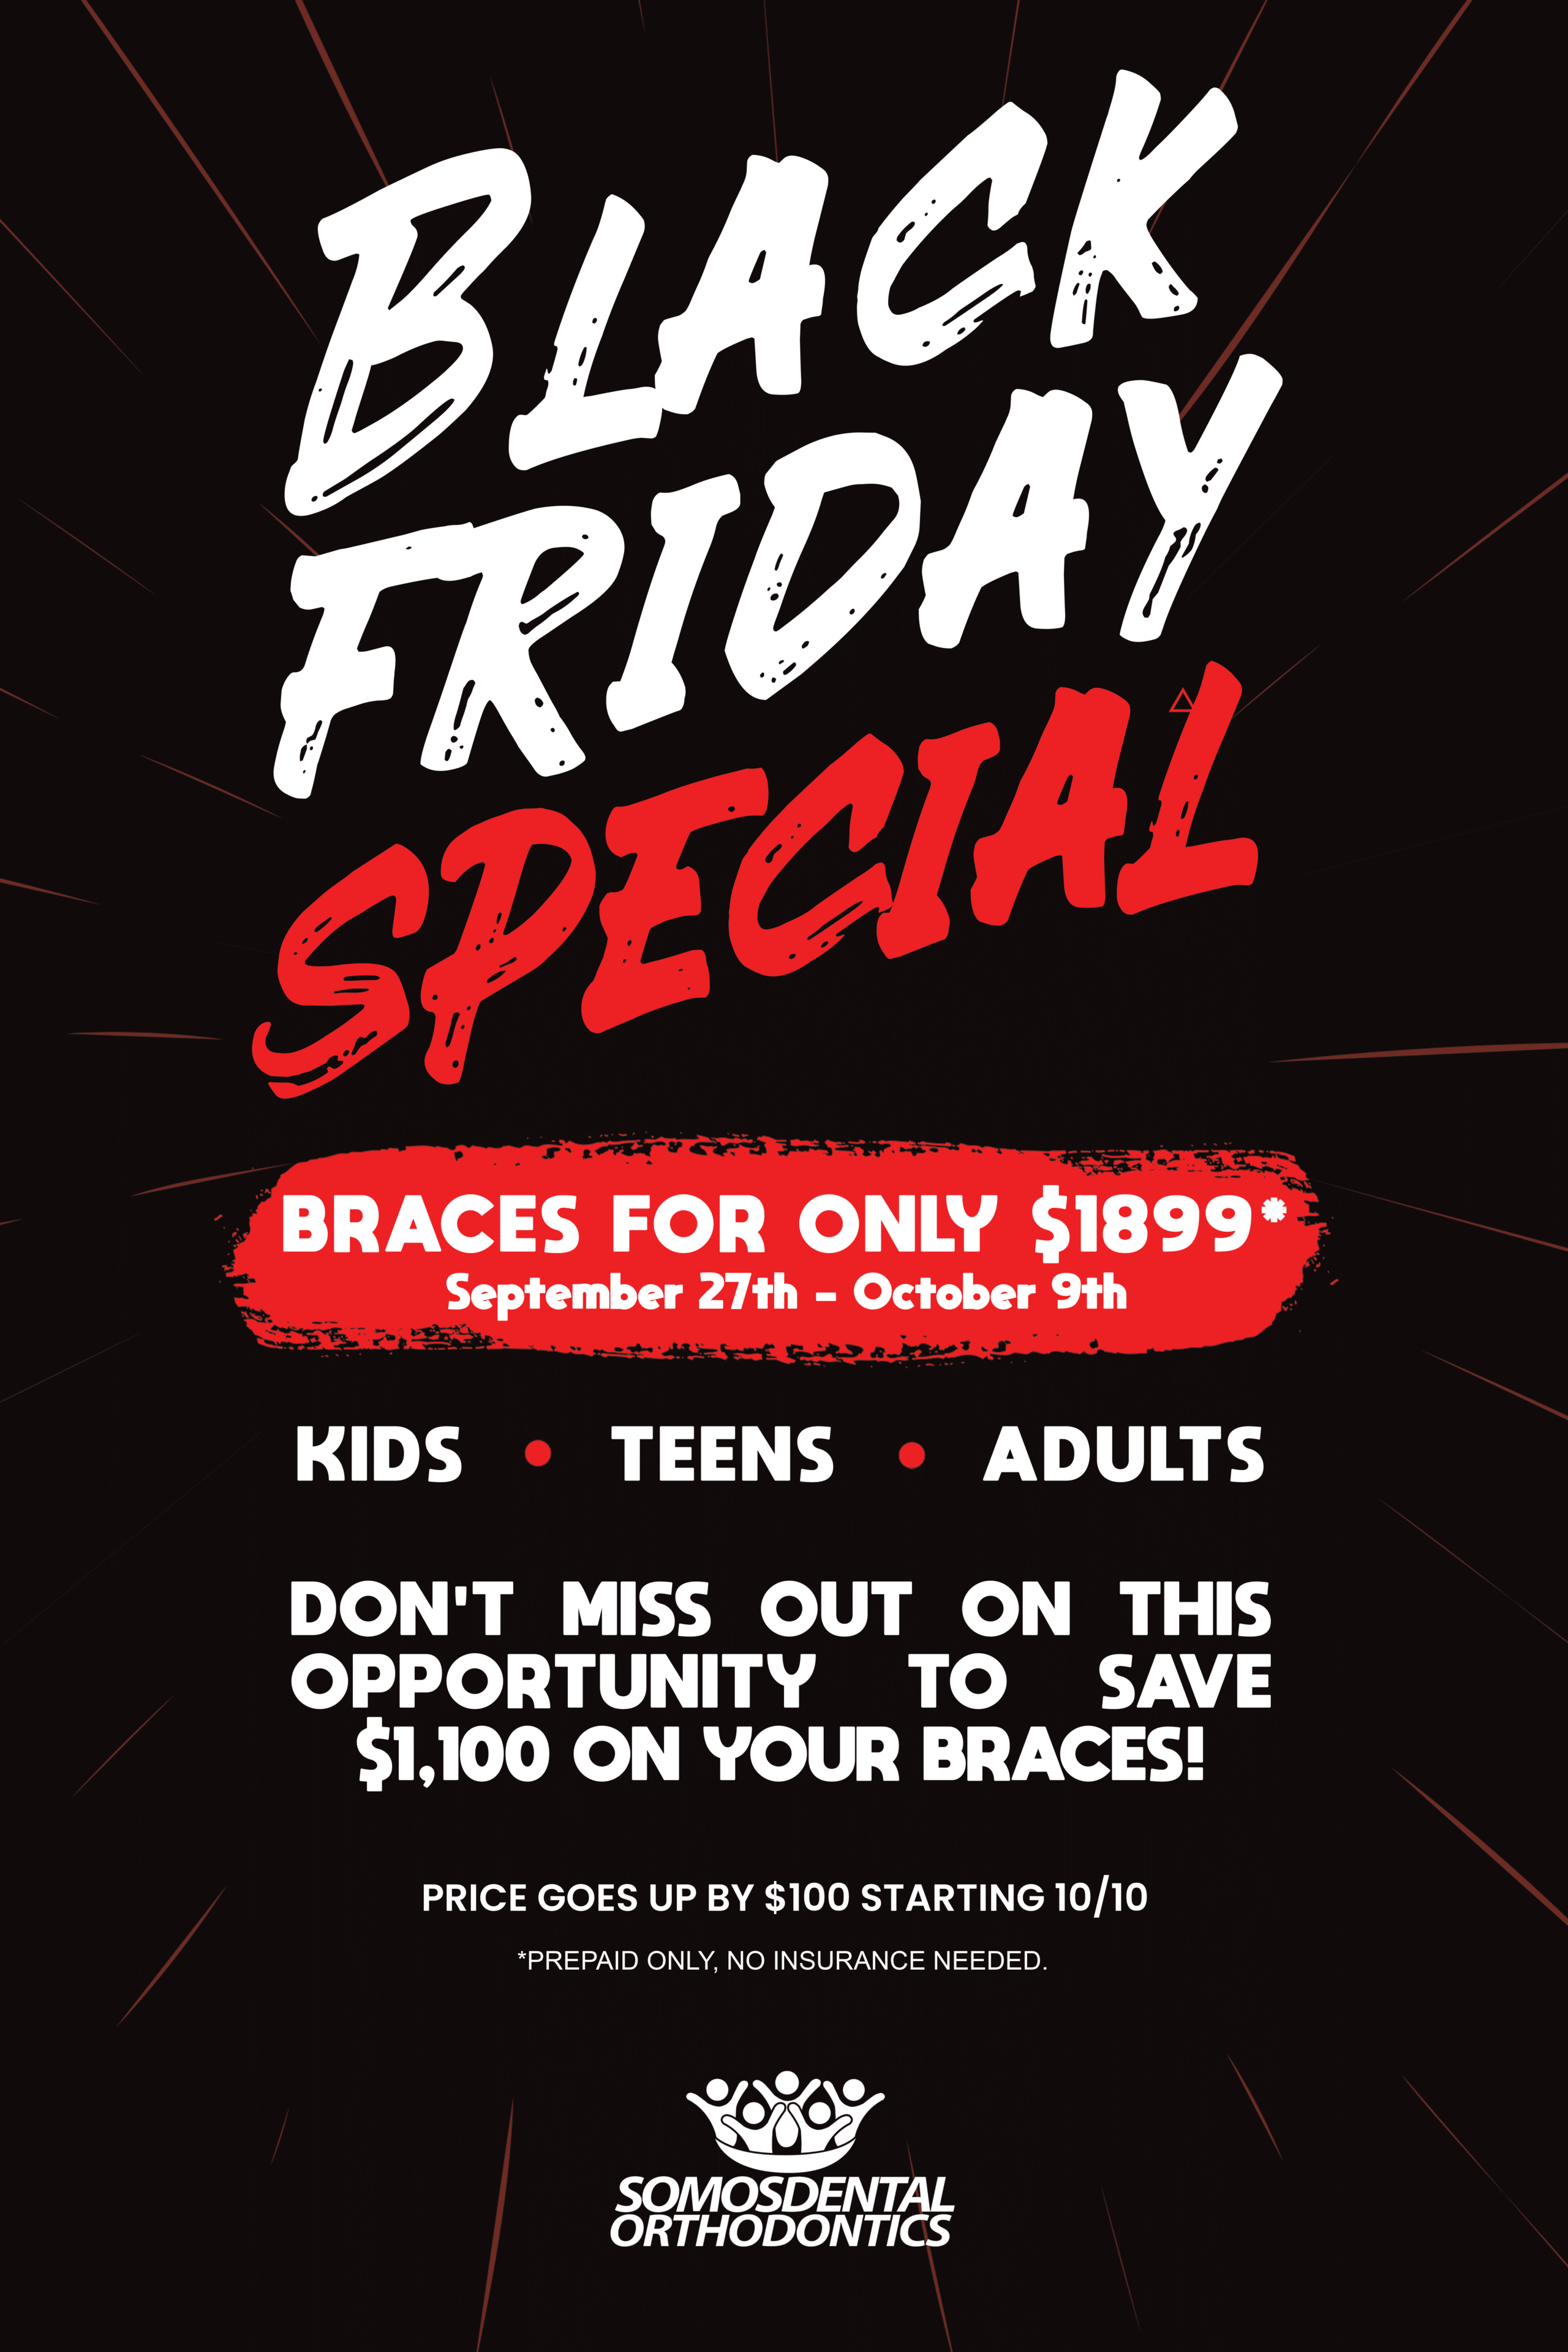 Somos Dental Black Friday Special on Braces